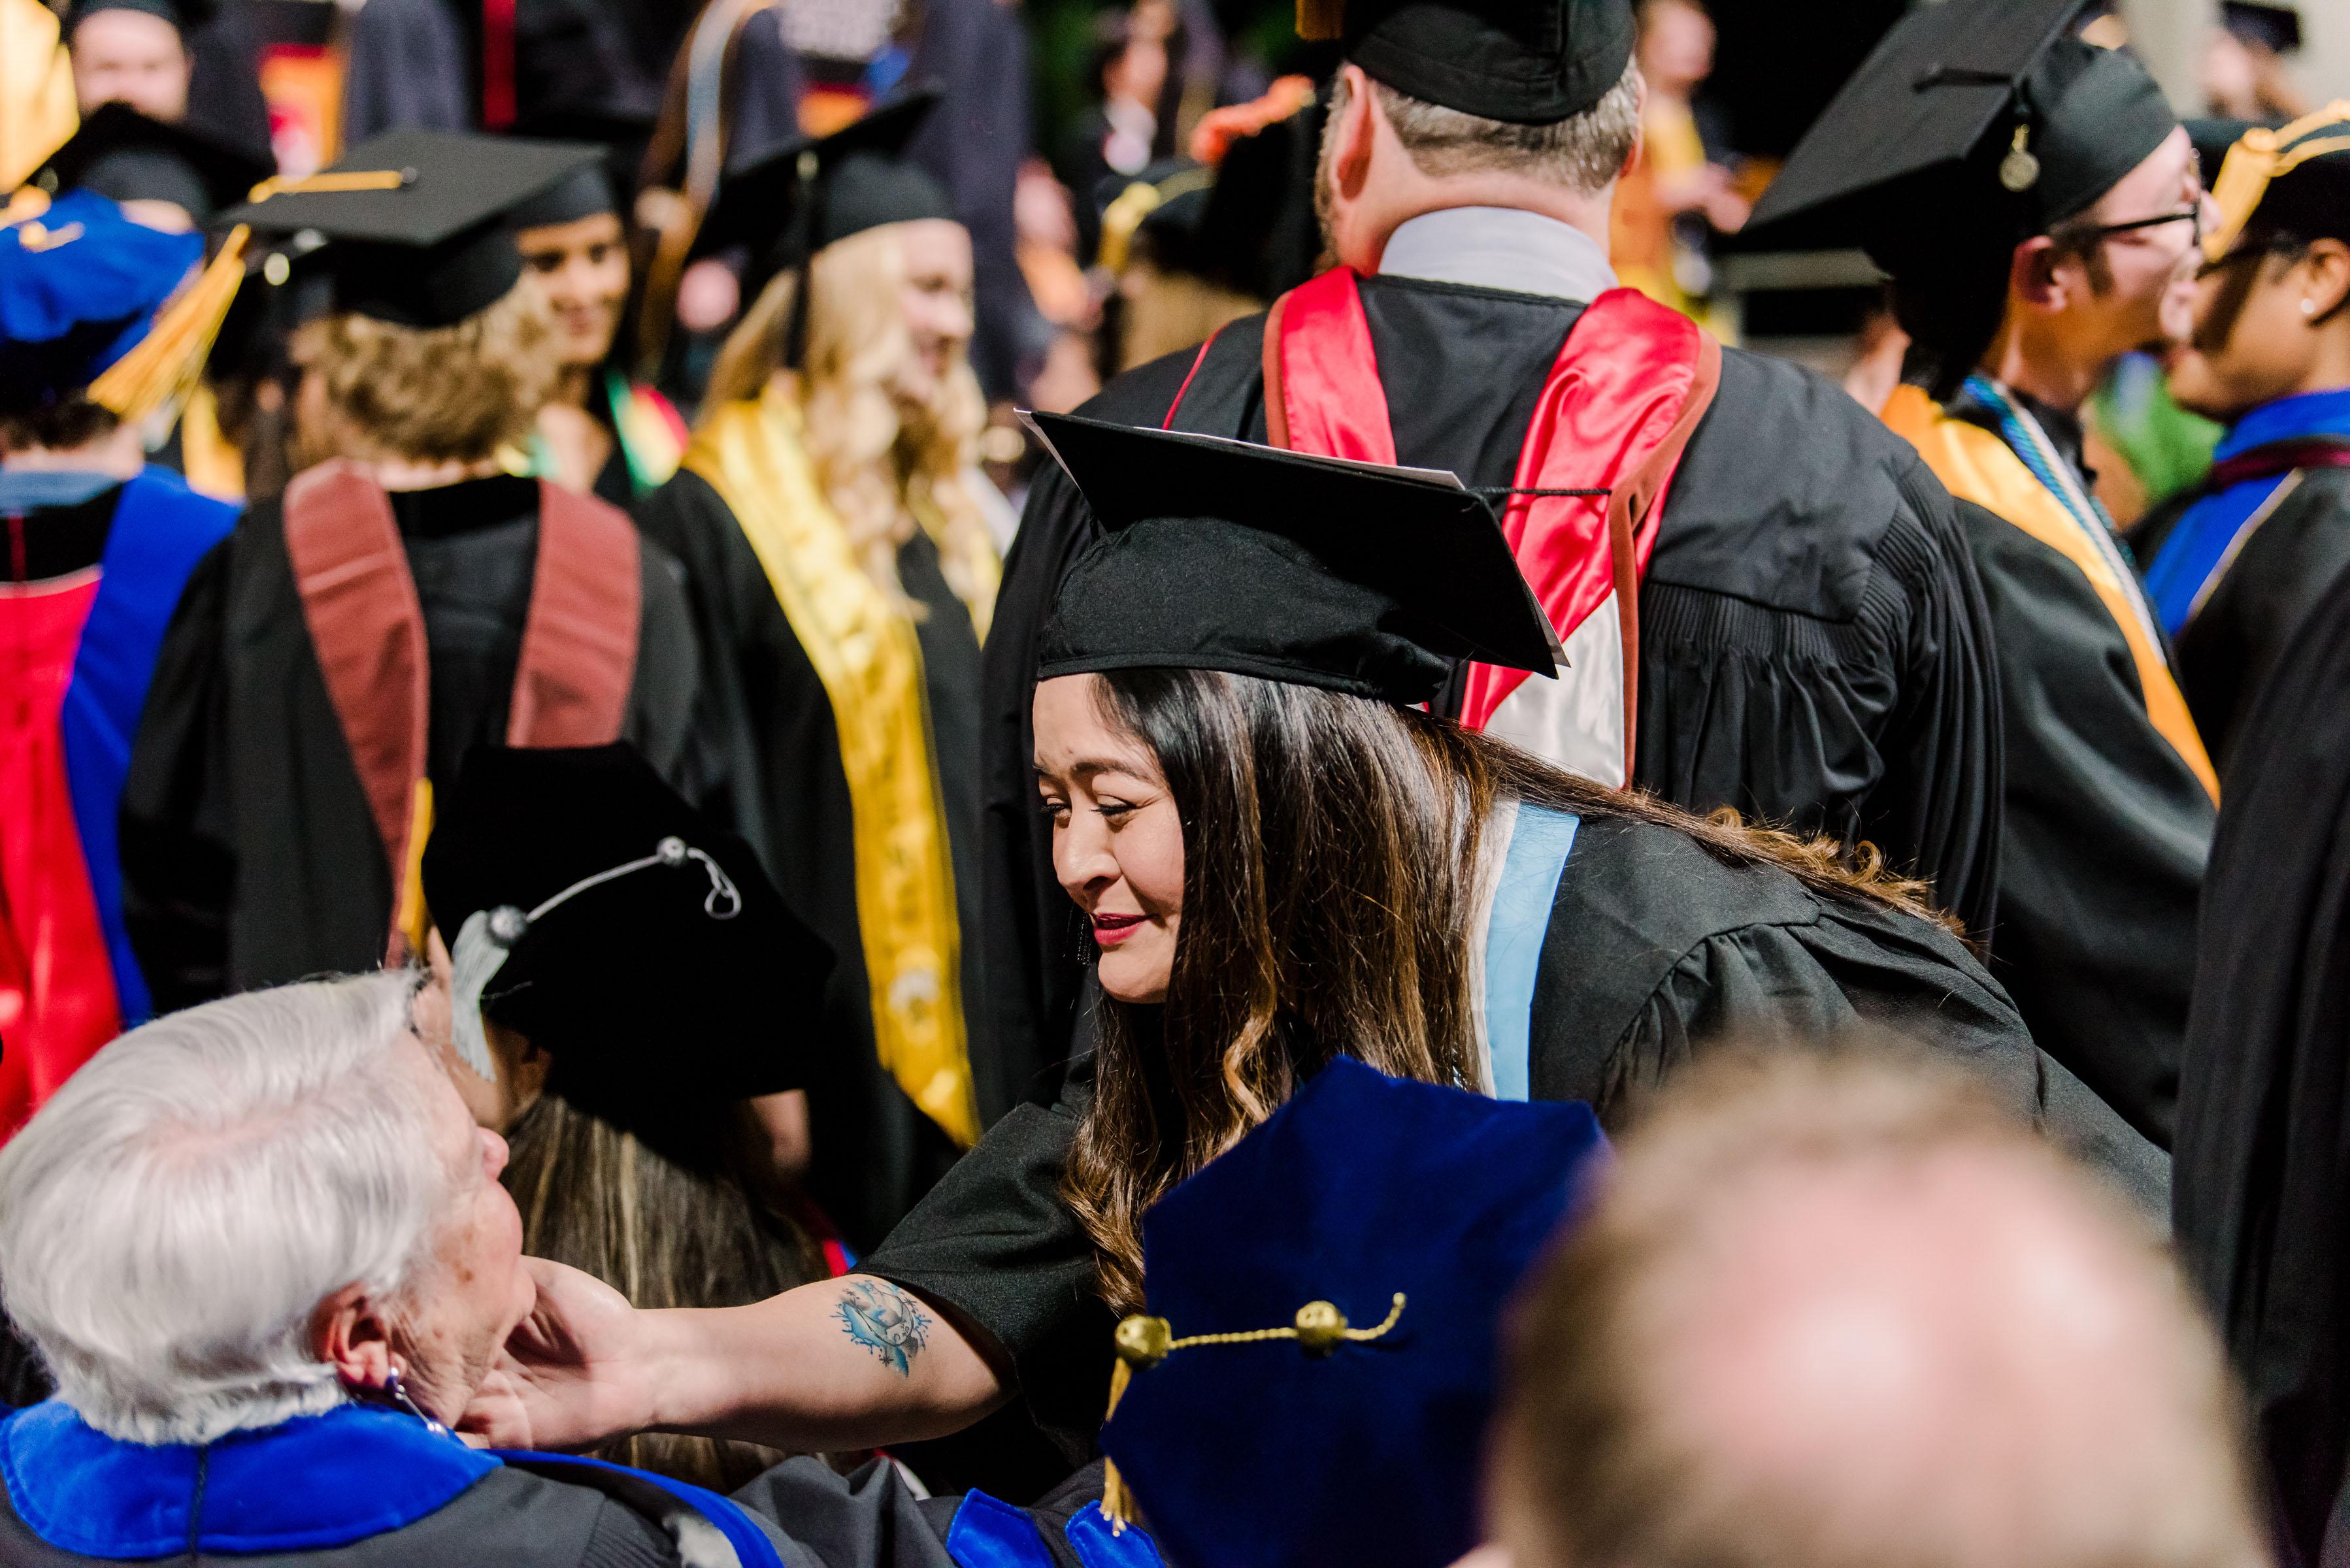 Women reaches to embrace older women at graduation